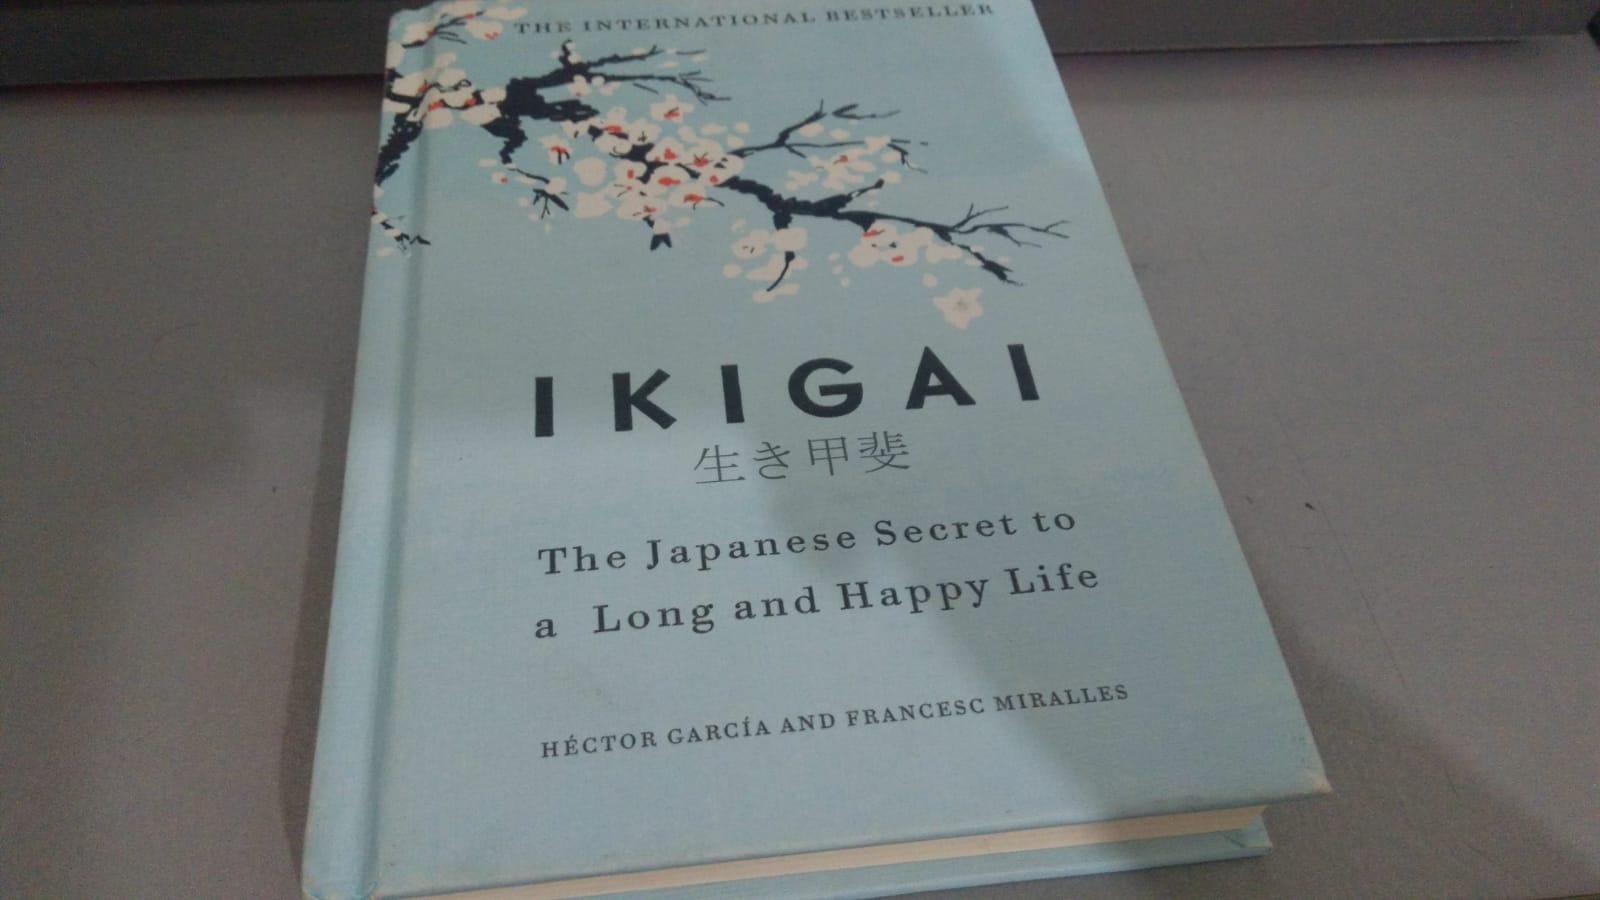 كتاب ikigai